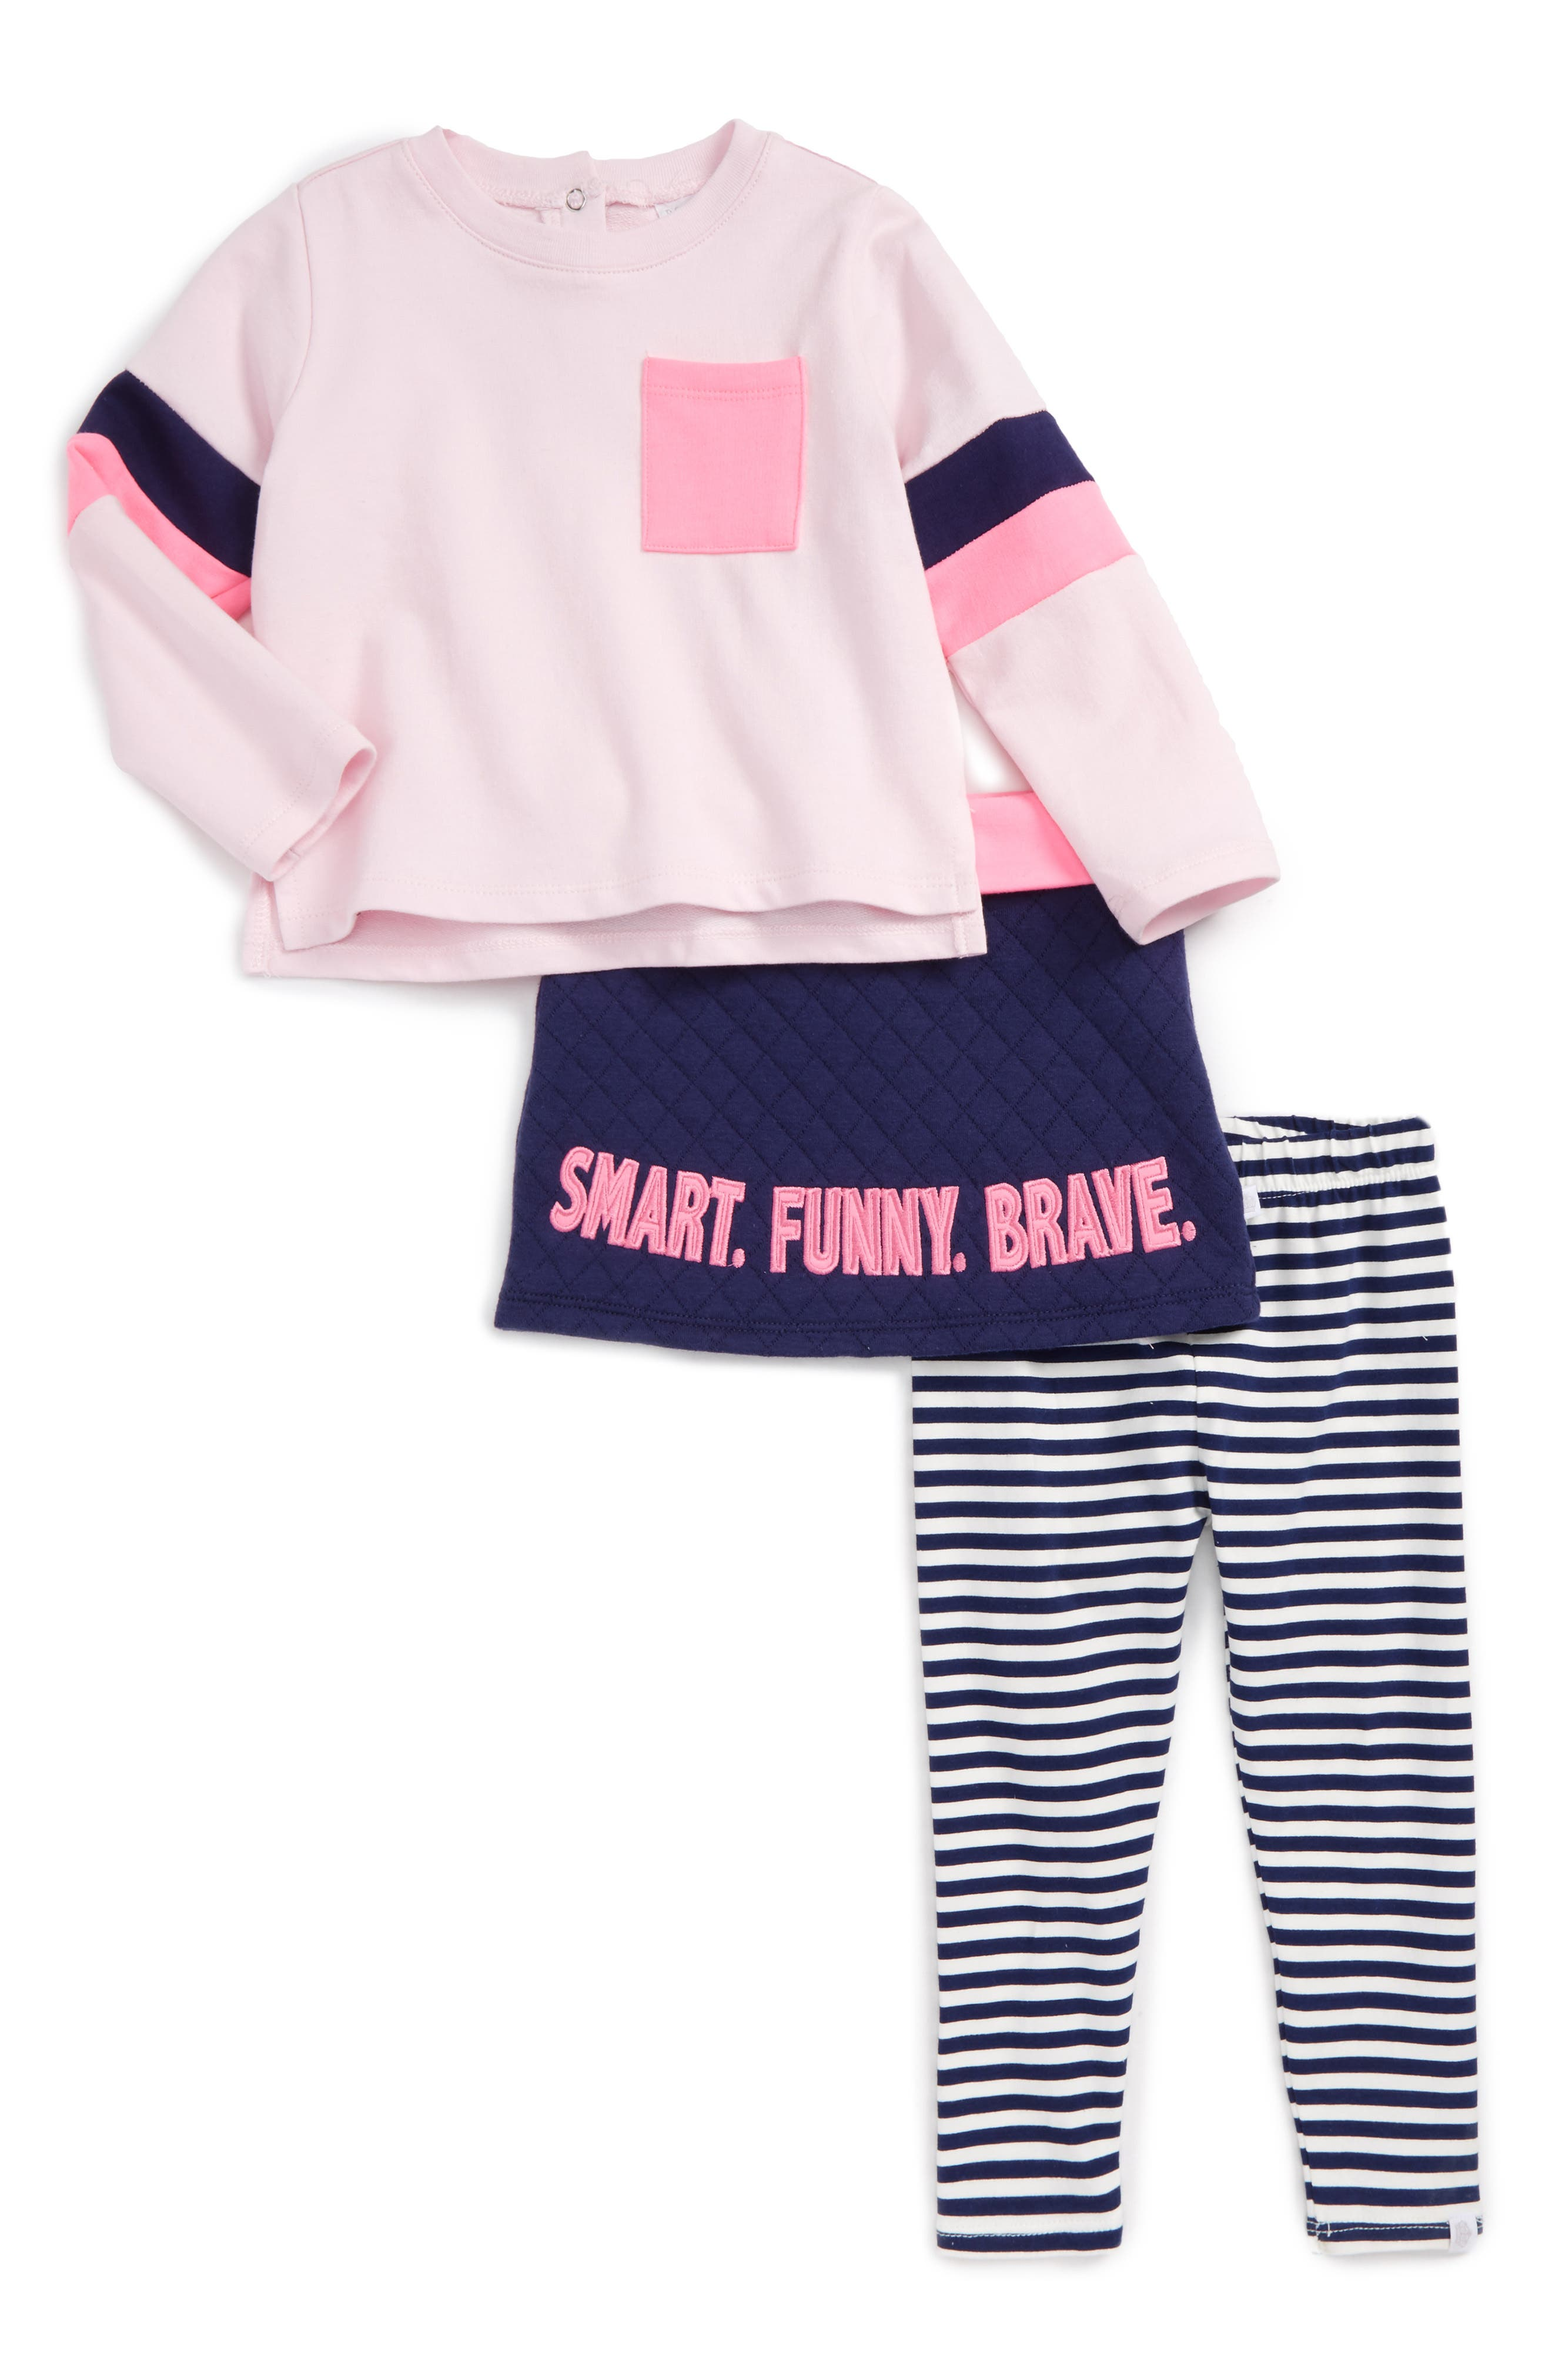 Smart Funny Brave Tee, Leggings & Skirt Set,                             Main thumbnail 1, color,                             Pink